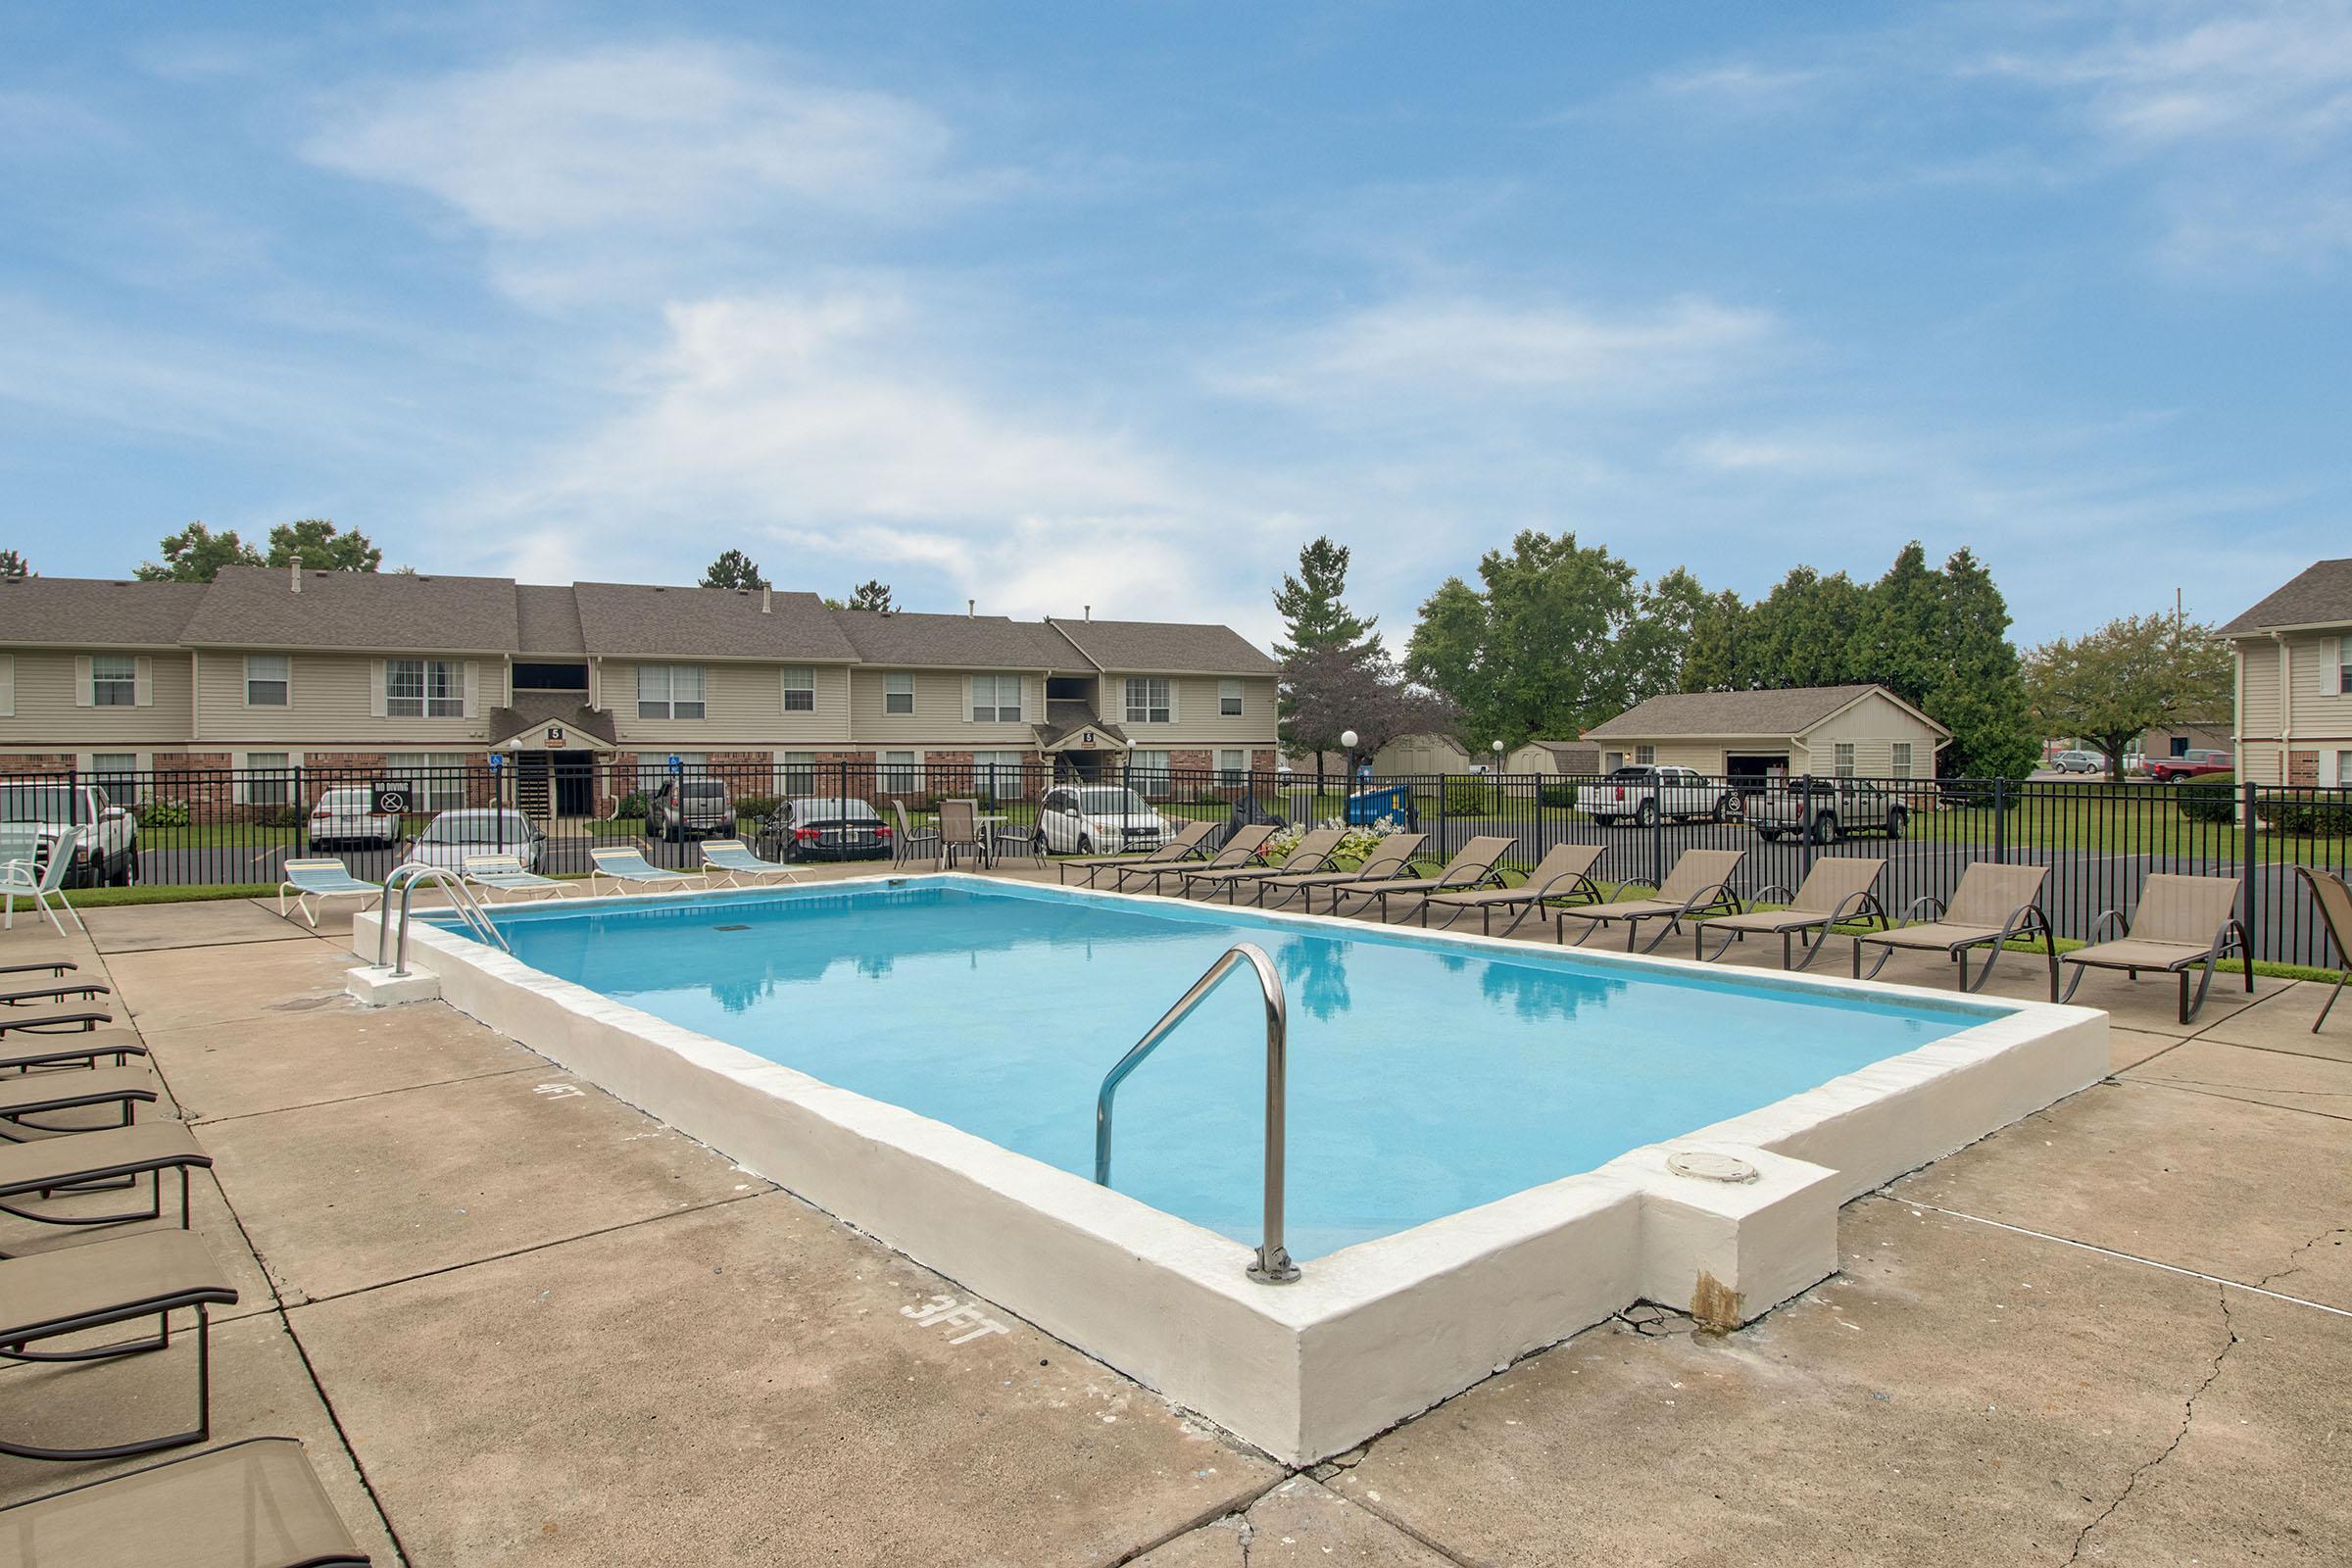 Pool_Village-Green_1700-N-Wayne-St-Angola-IN_RPI_II-289669_01.jpg